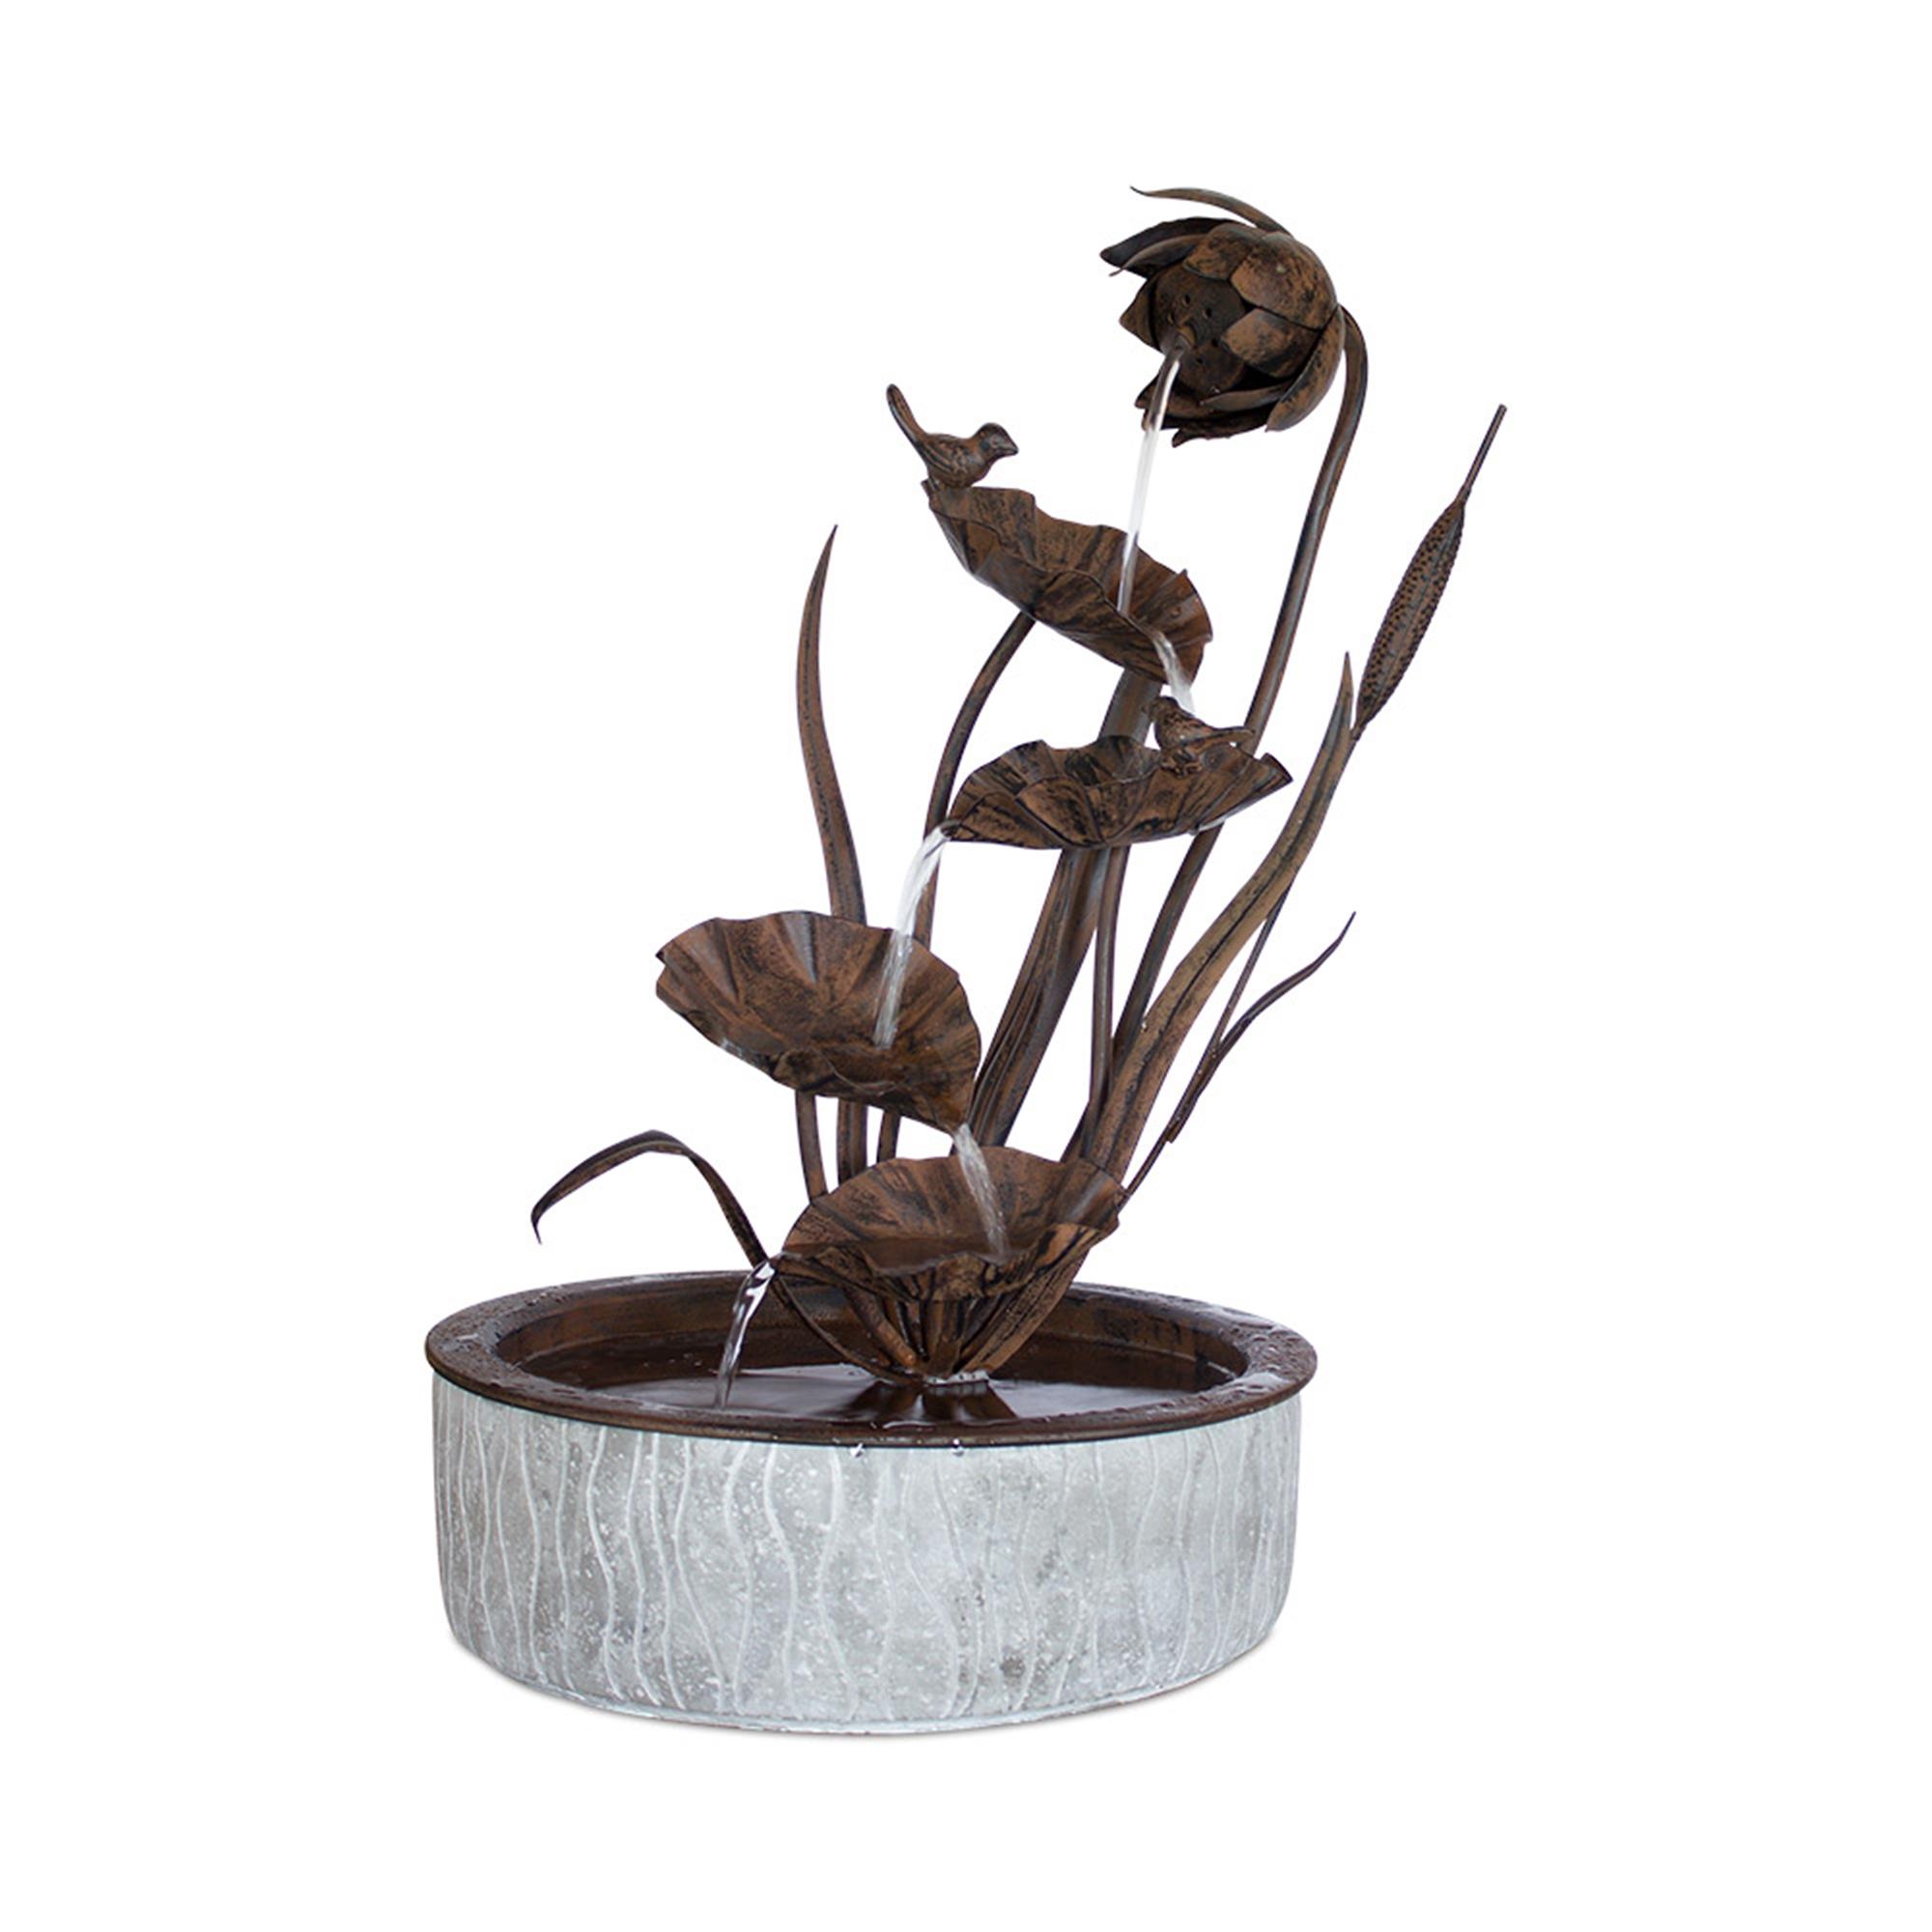 "Floral Fountain 13.5"" x 24""H, Metal"